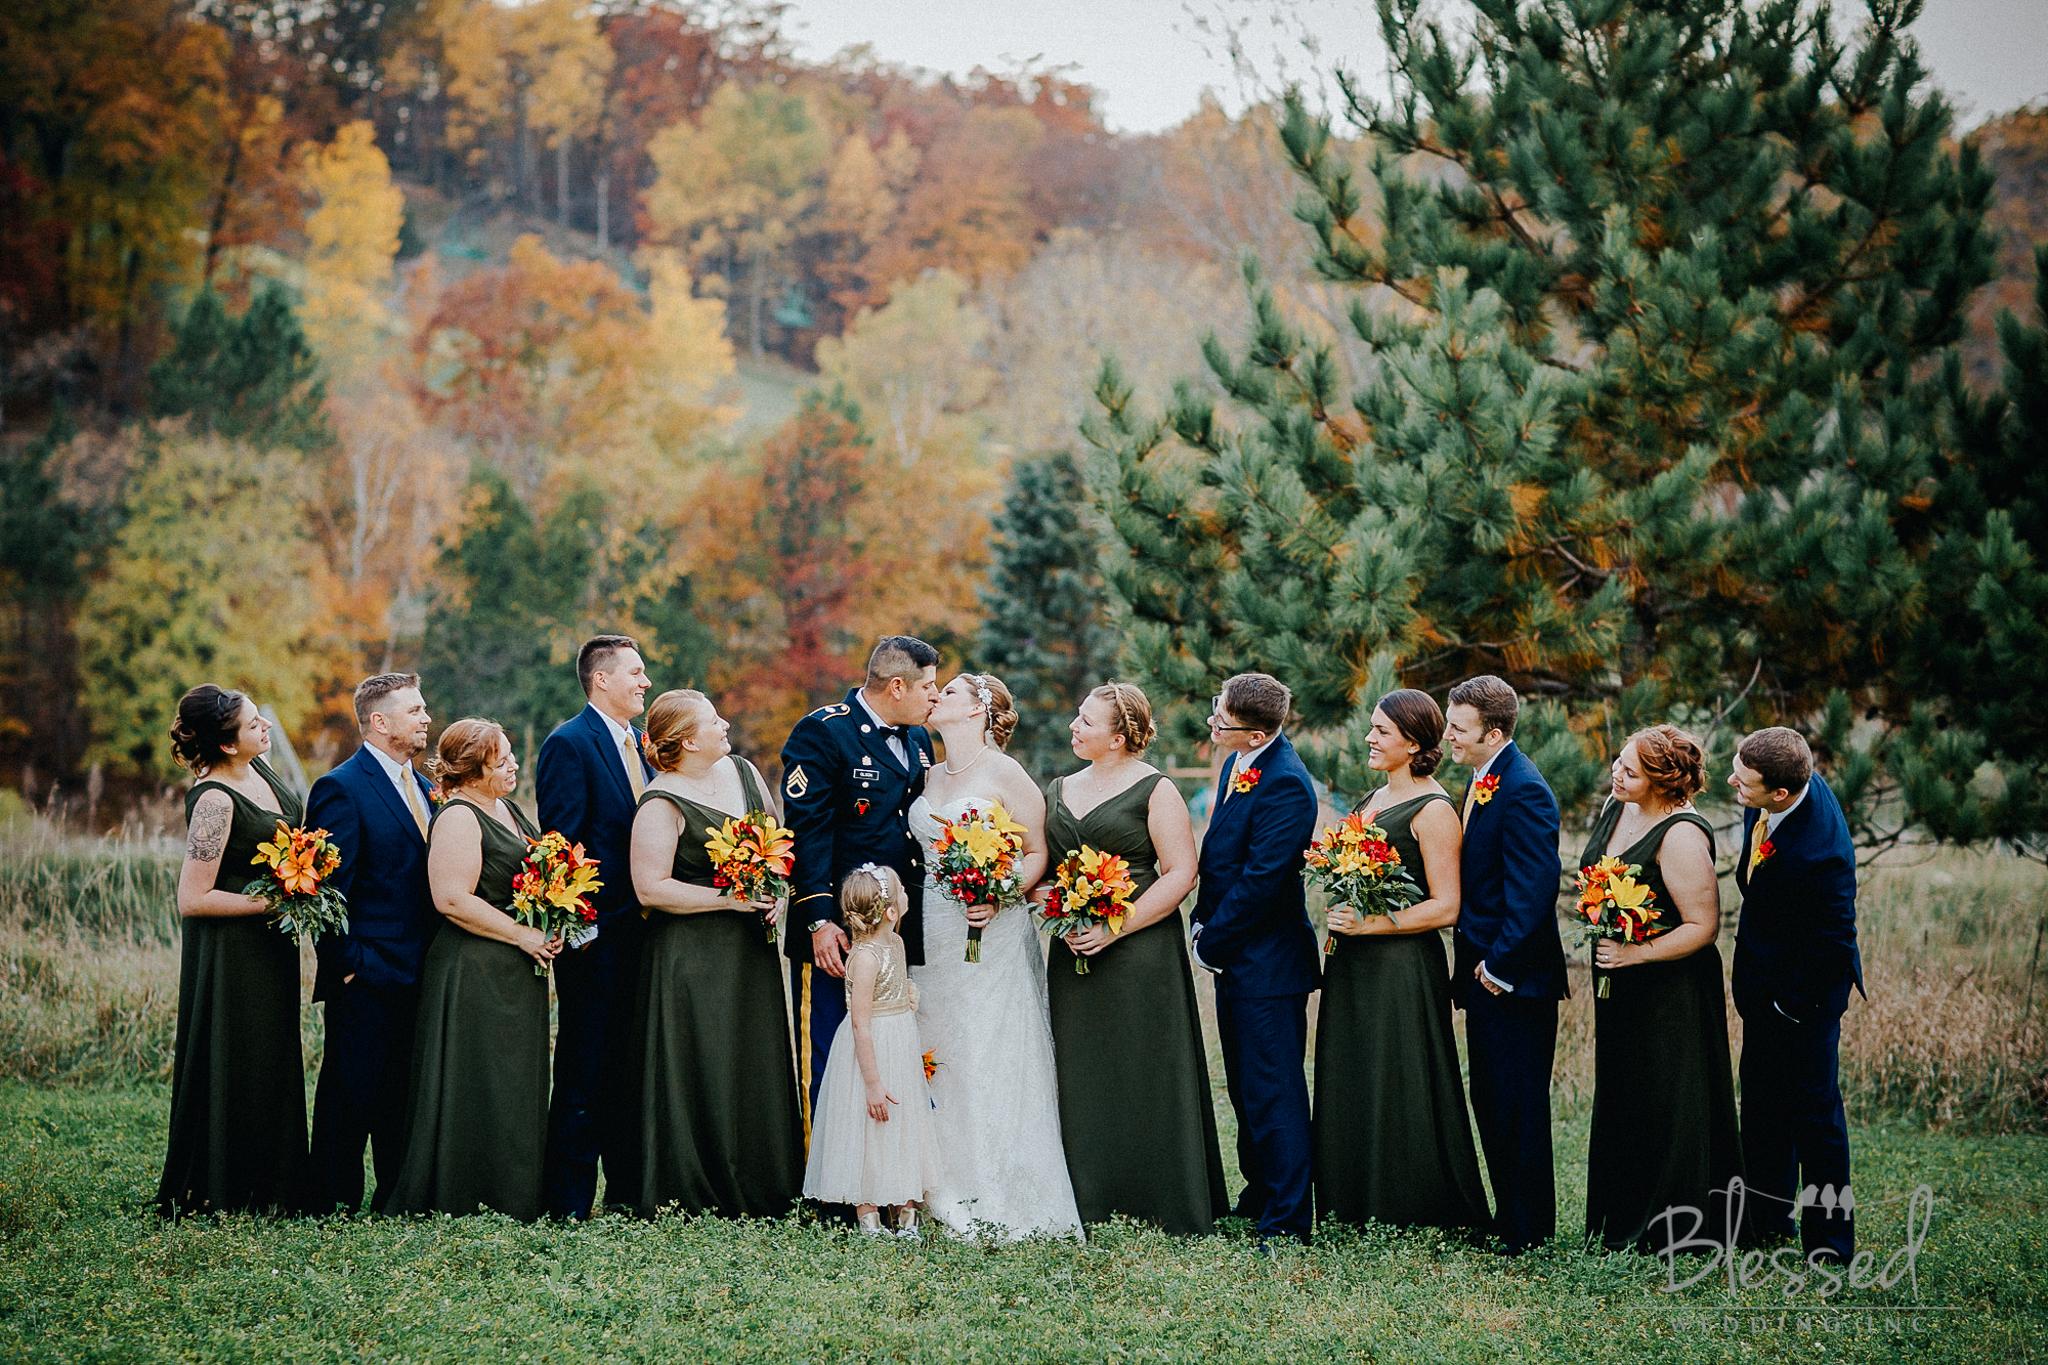 Destination Wedding Photography Minnesota By Blessed Wedding Photographers-57.jpg